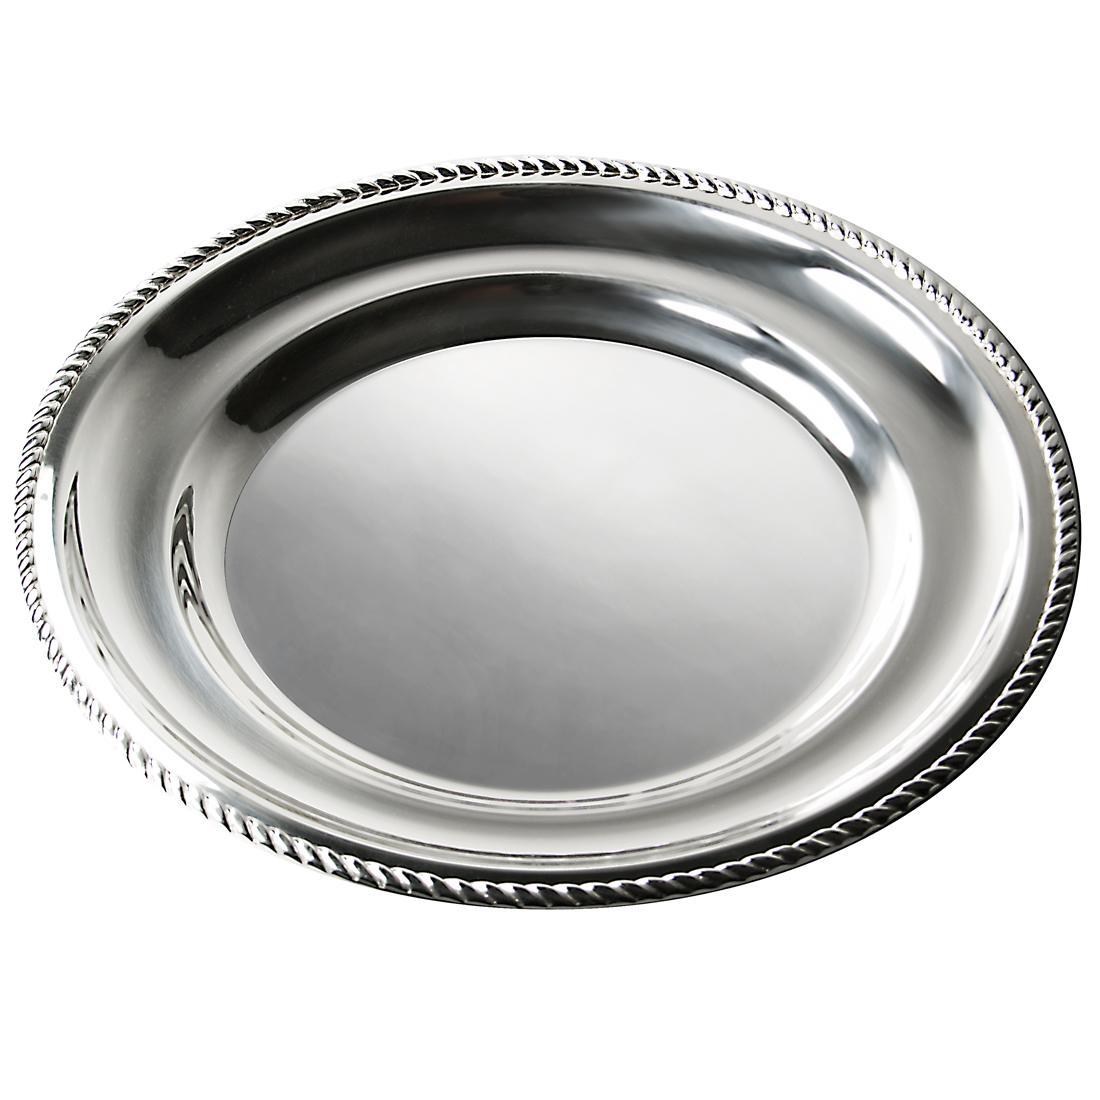 "14"" Round Platter in Rope"